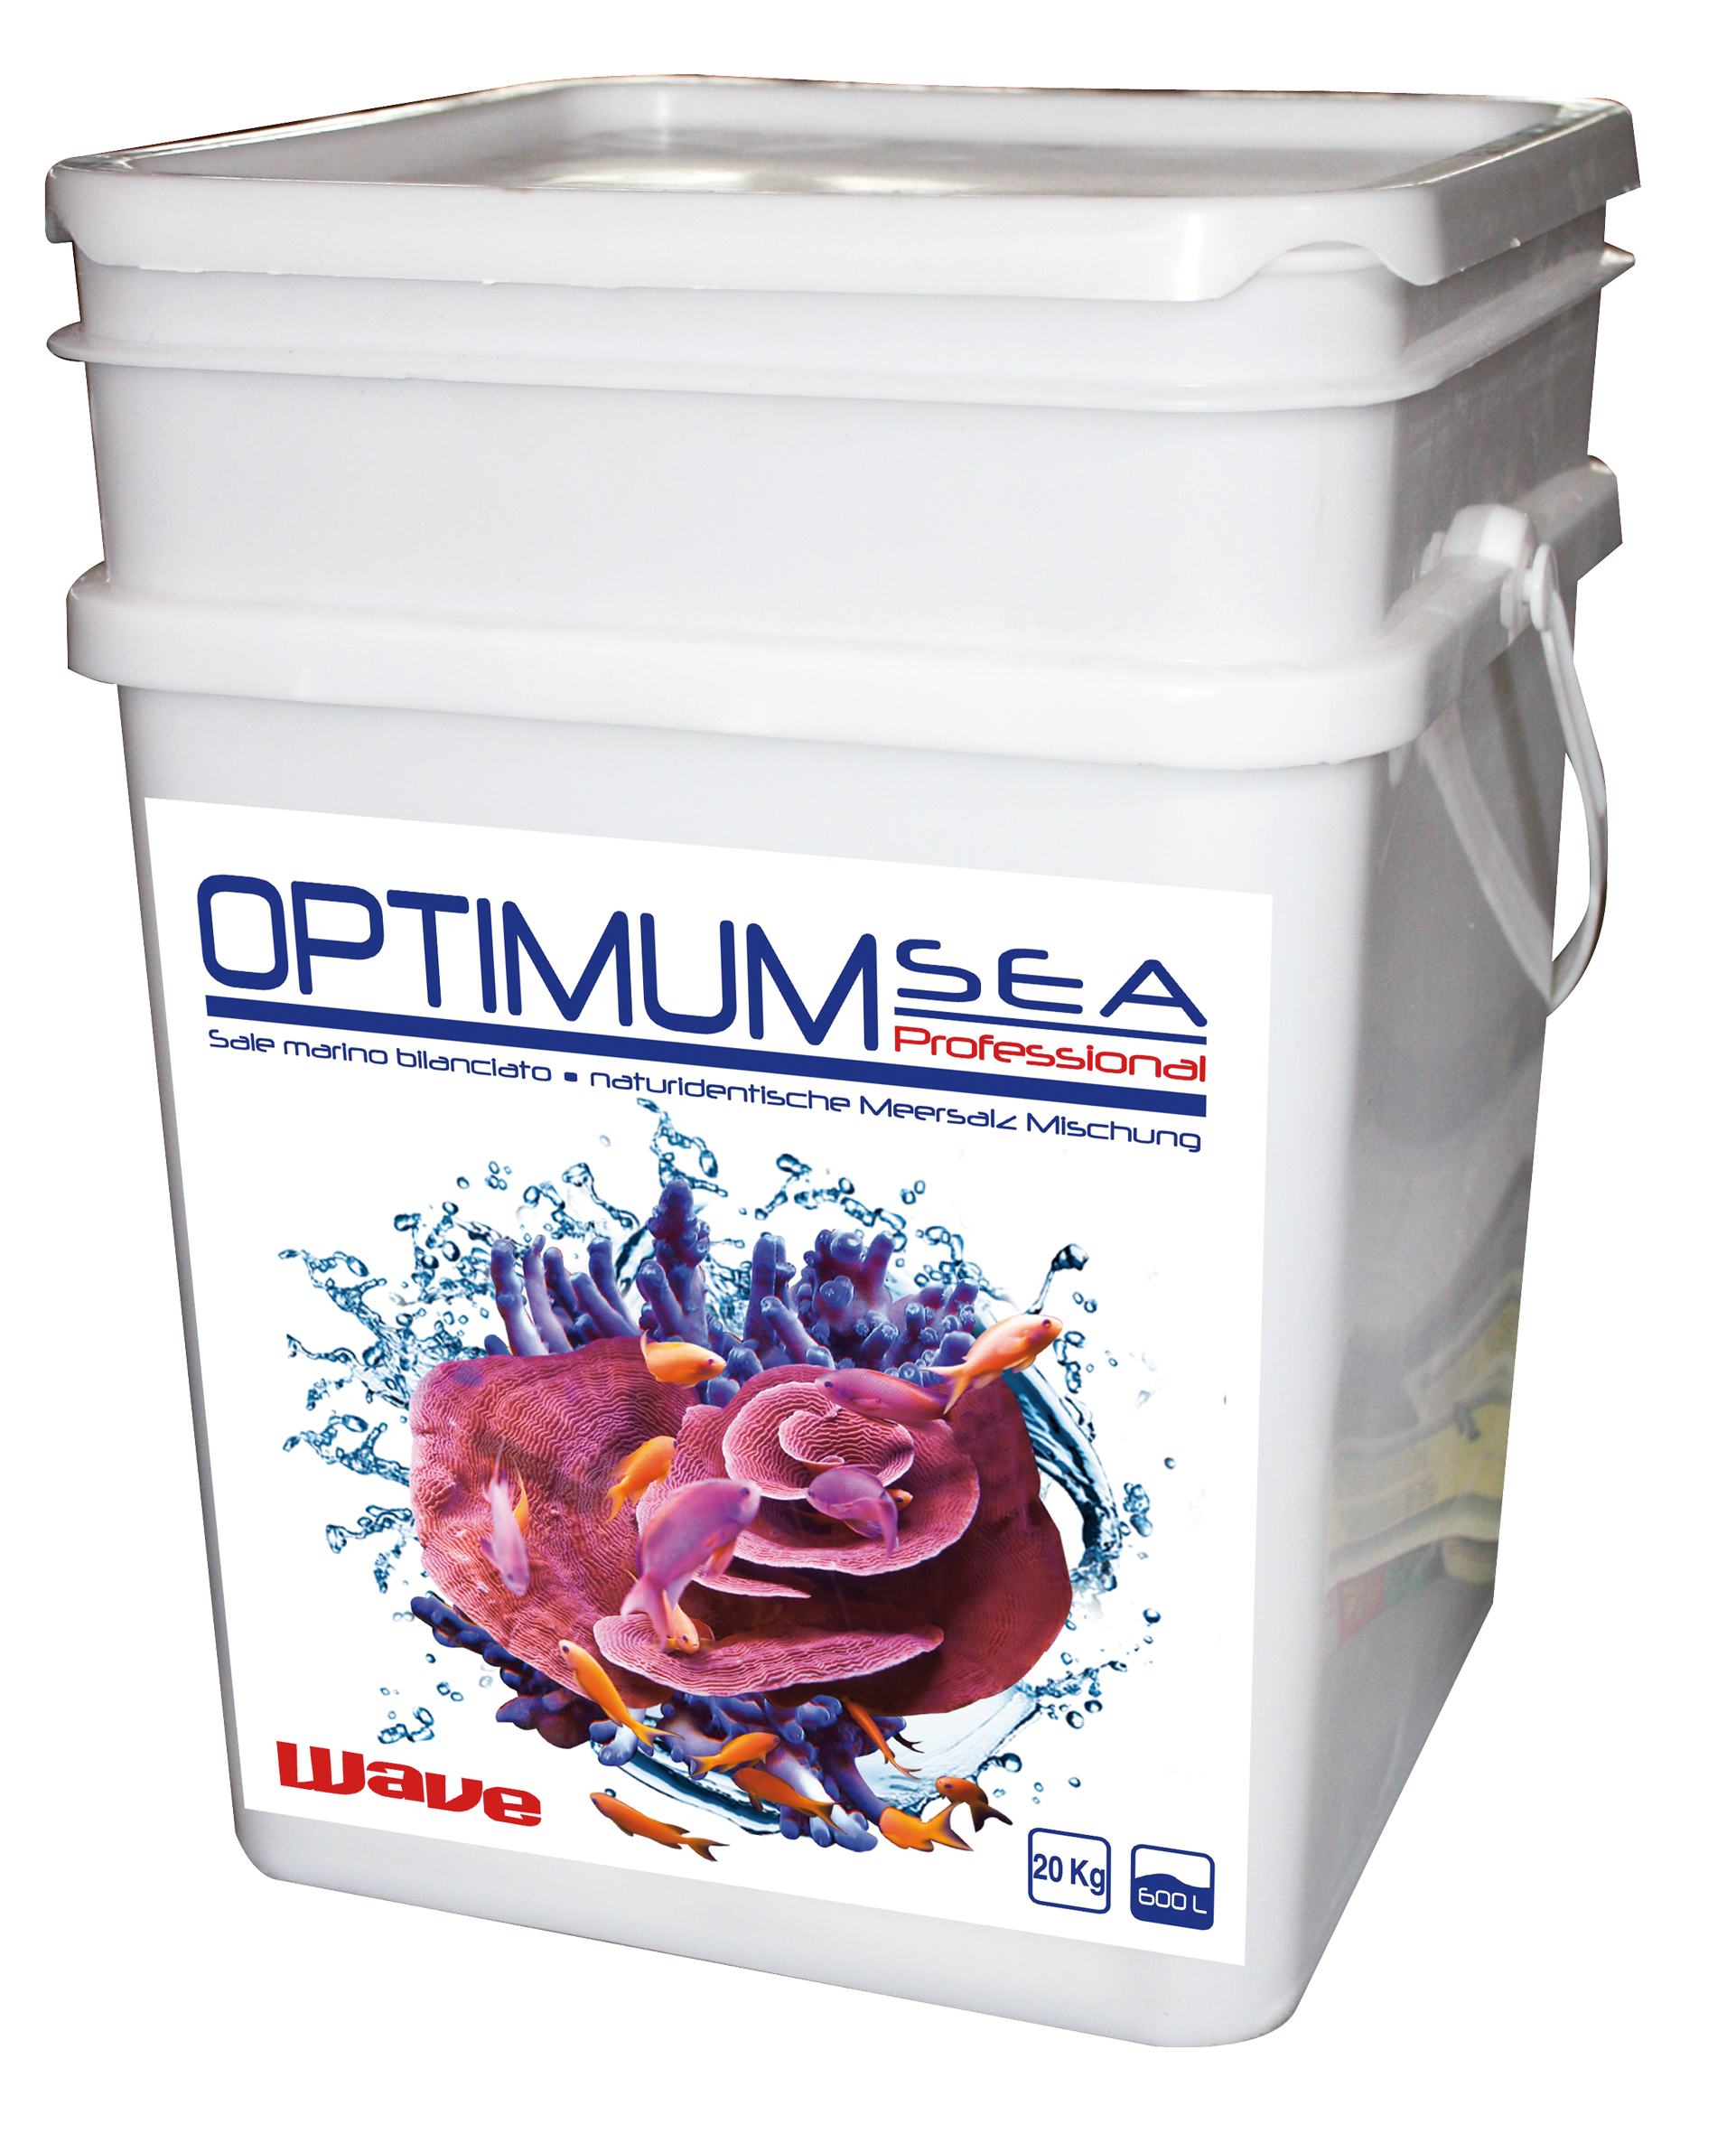 Соль д/морск. аквариумов Wave Optimum Sea Professional, 20 кг, на 600 лСредства для ухода за аквариумом<br><br><br>Артикул: A0020524<br>Бренд: Croci<br>Родина бренда: Италия